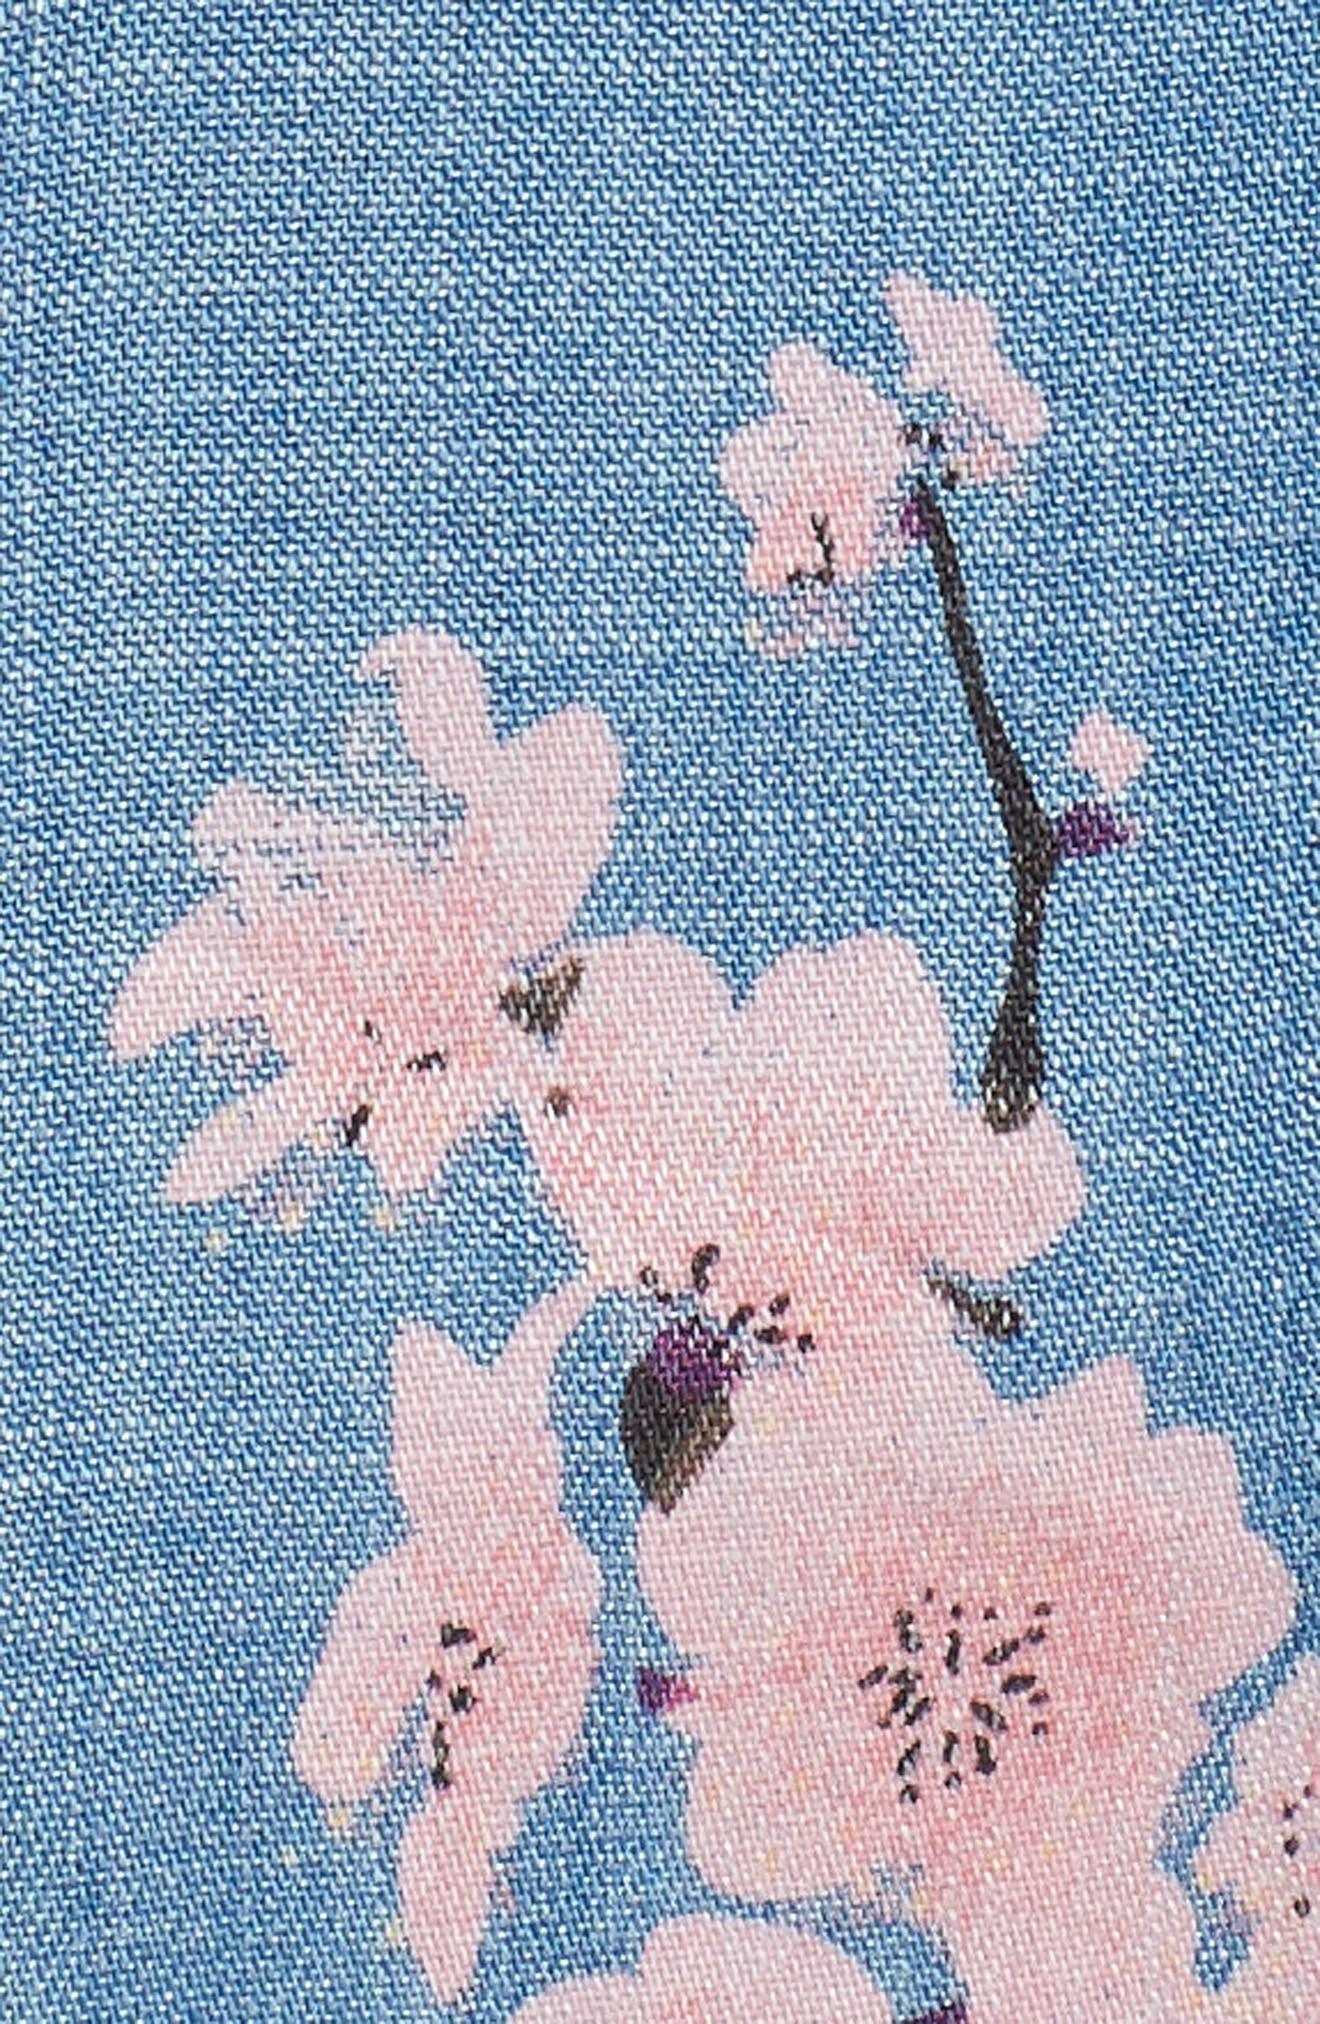 Cherry Blossom Kimono,                             Alternate thumbnail 4, color,                             Blue Cherry Blossom